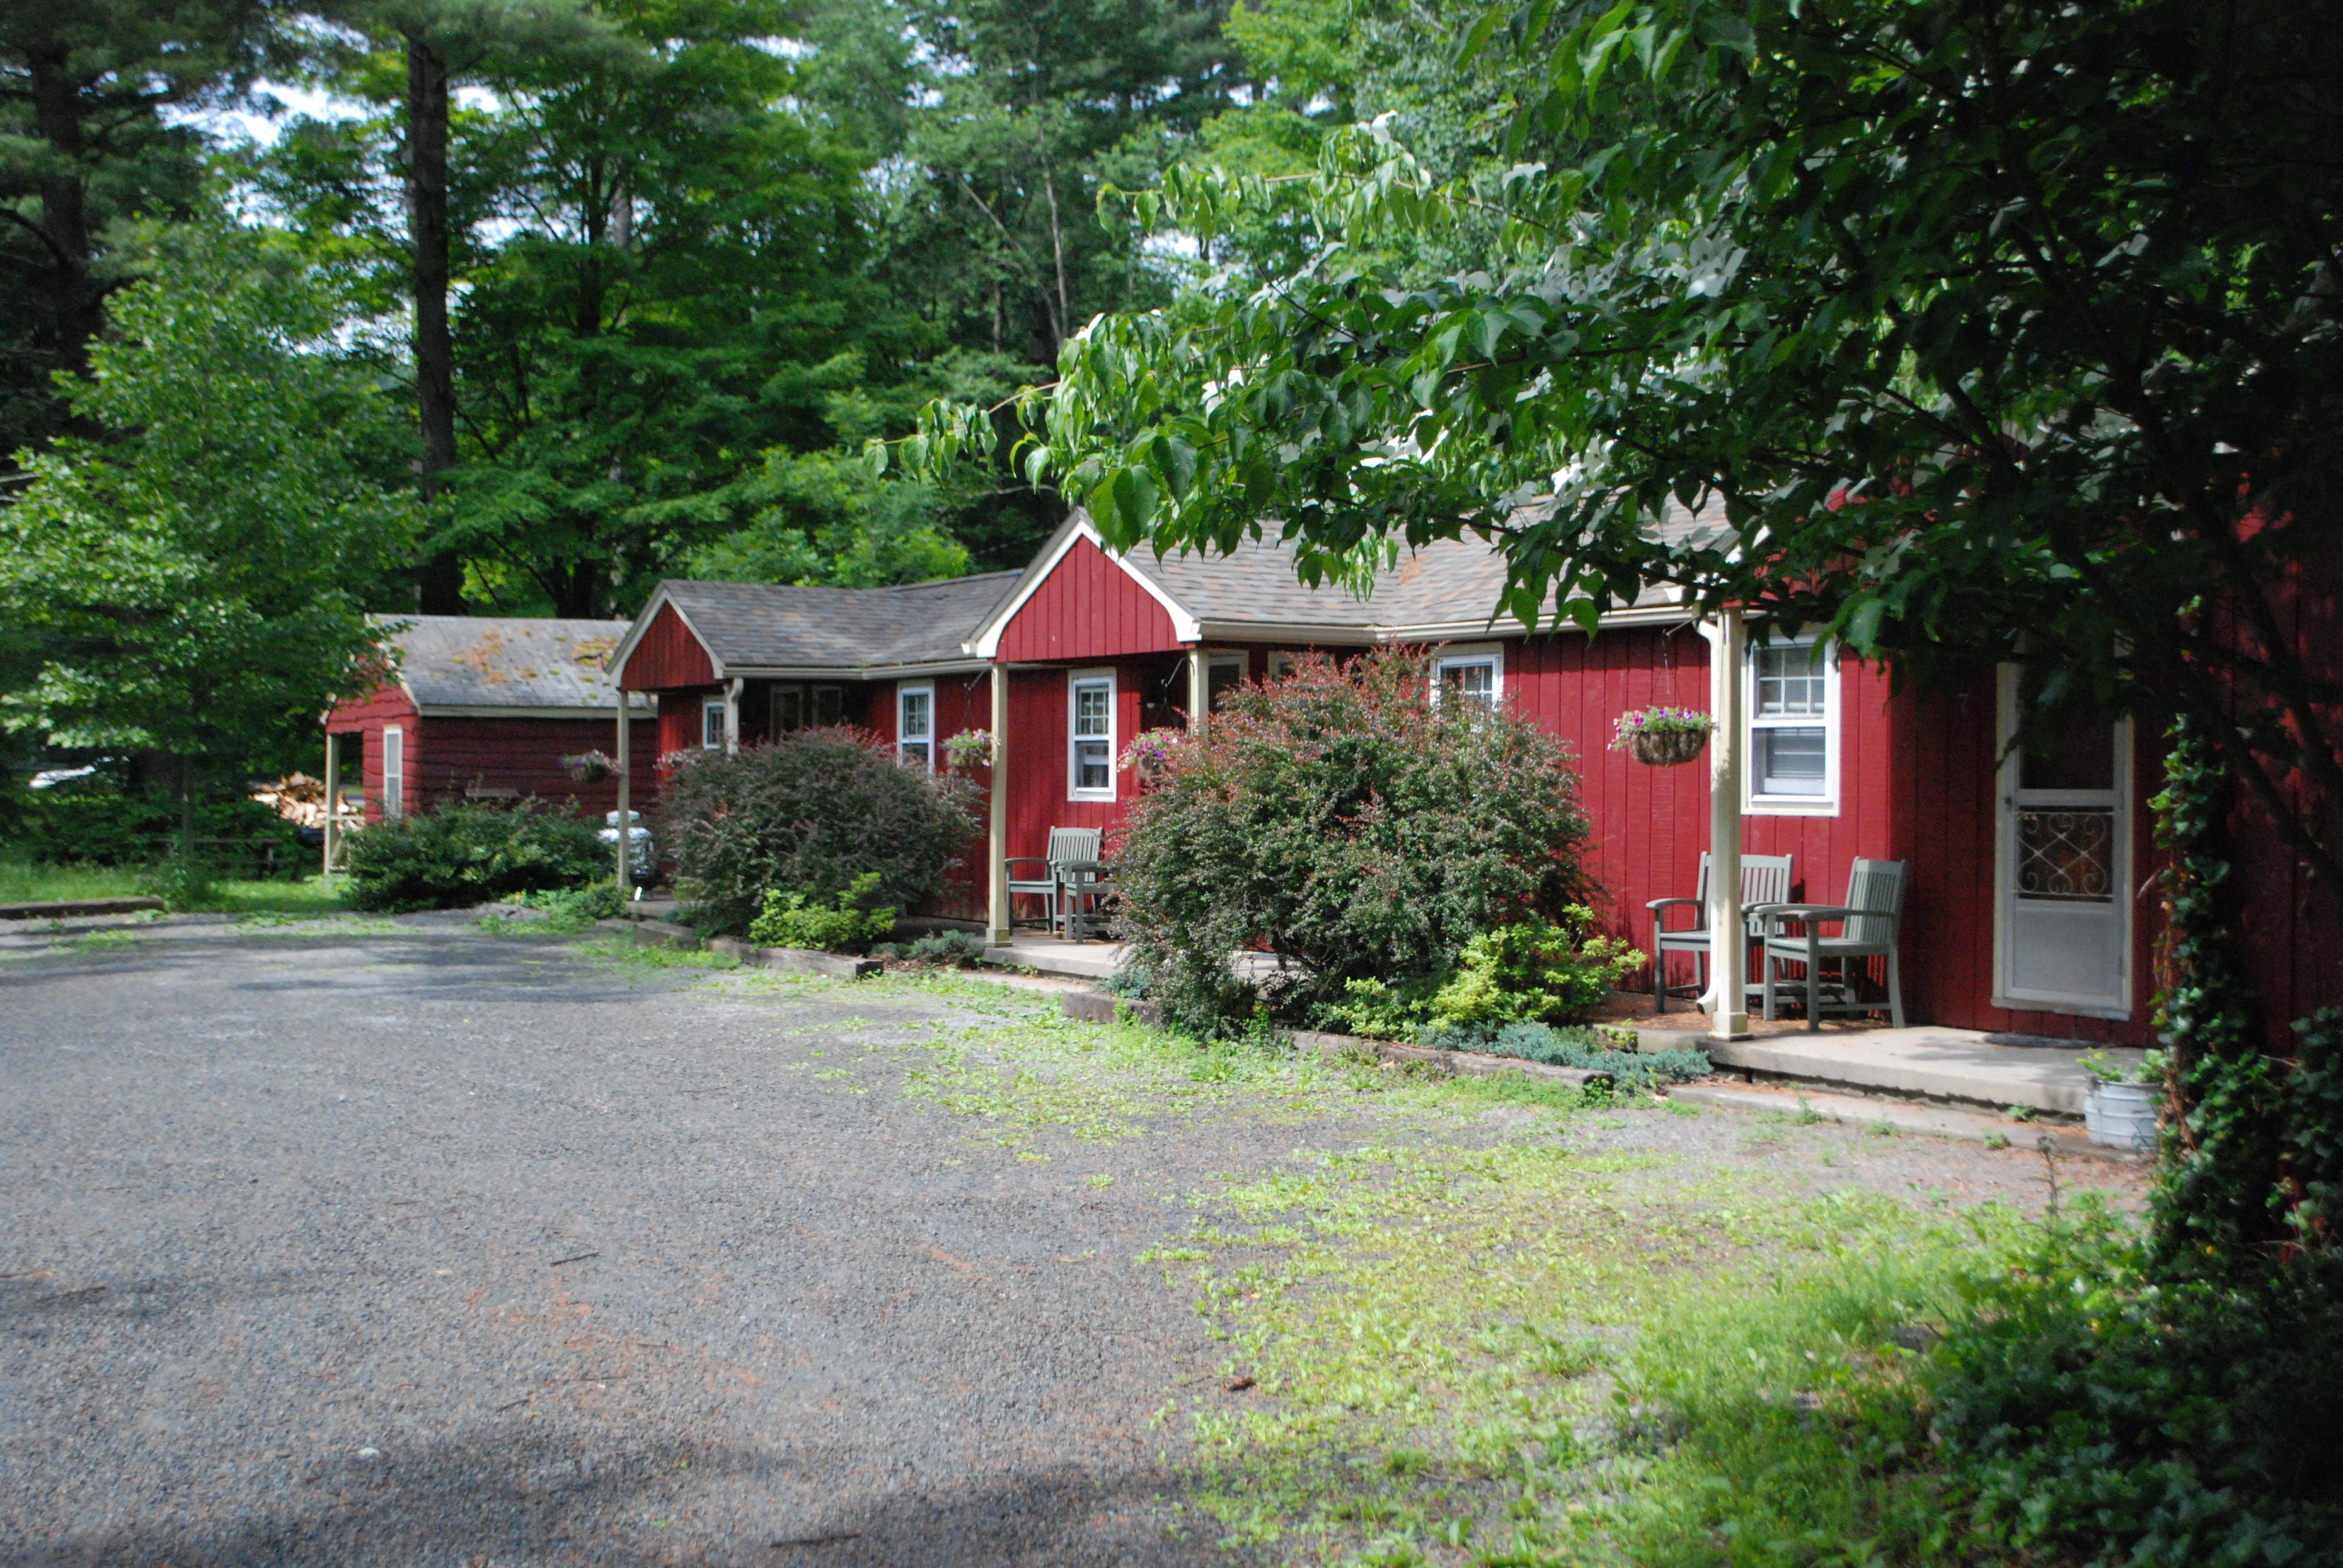 wilde bungalow york ny glen vacation ideas catskills wrk new cabin renovation design mountaindale interior interiors rental community cabins